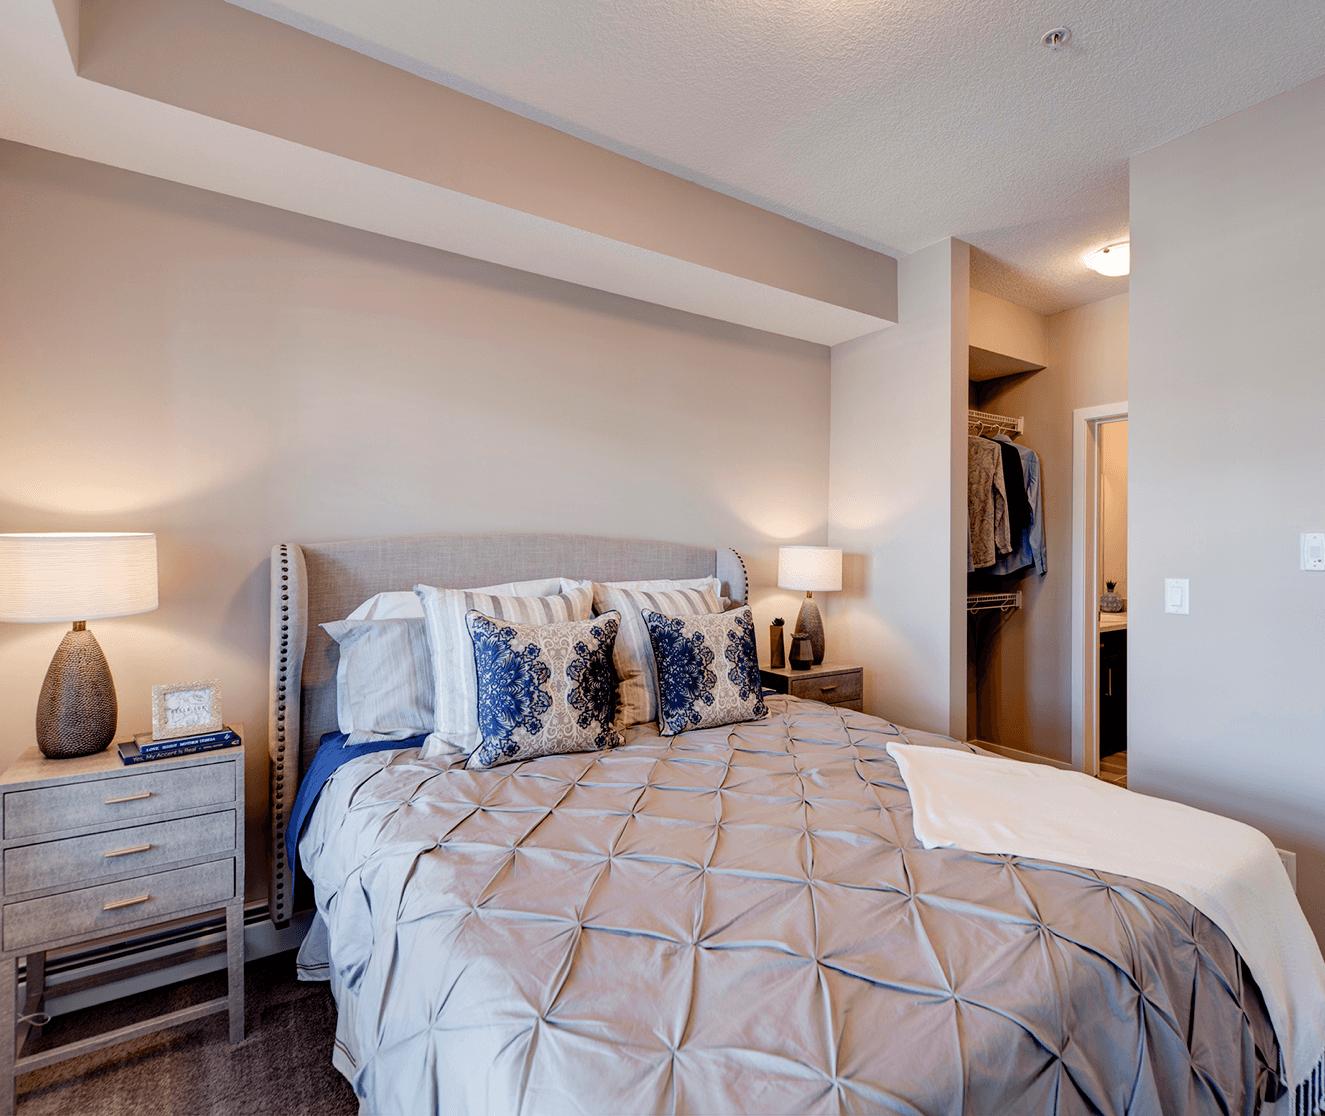 Good Reasons to Live in Cranston Birch Bedroom Image